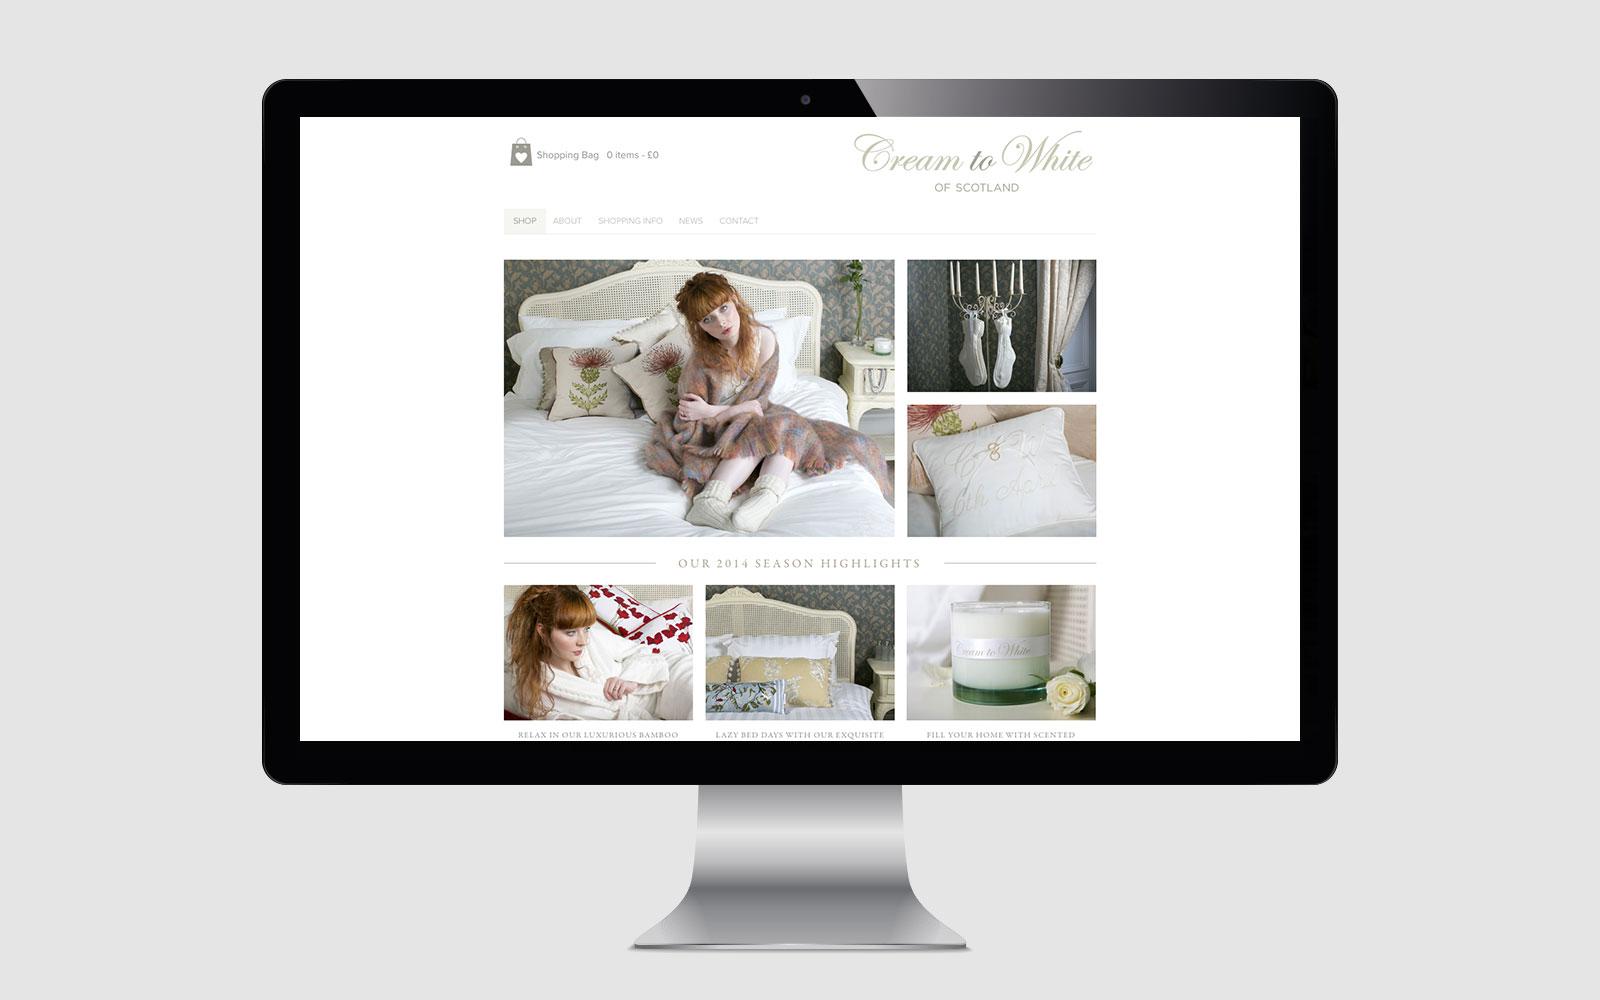 CBD-Cream-to-white-web2